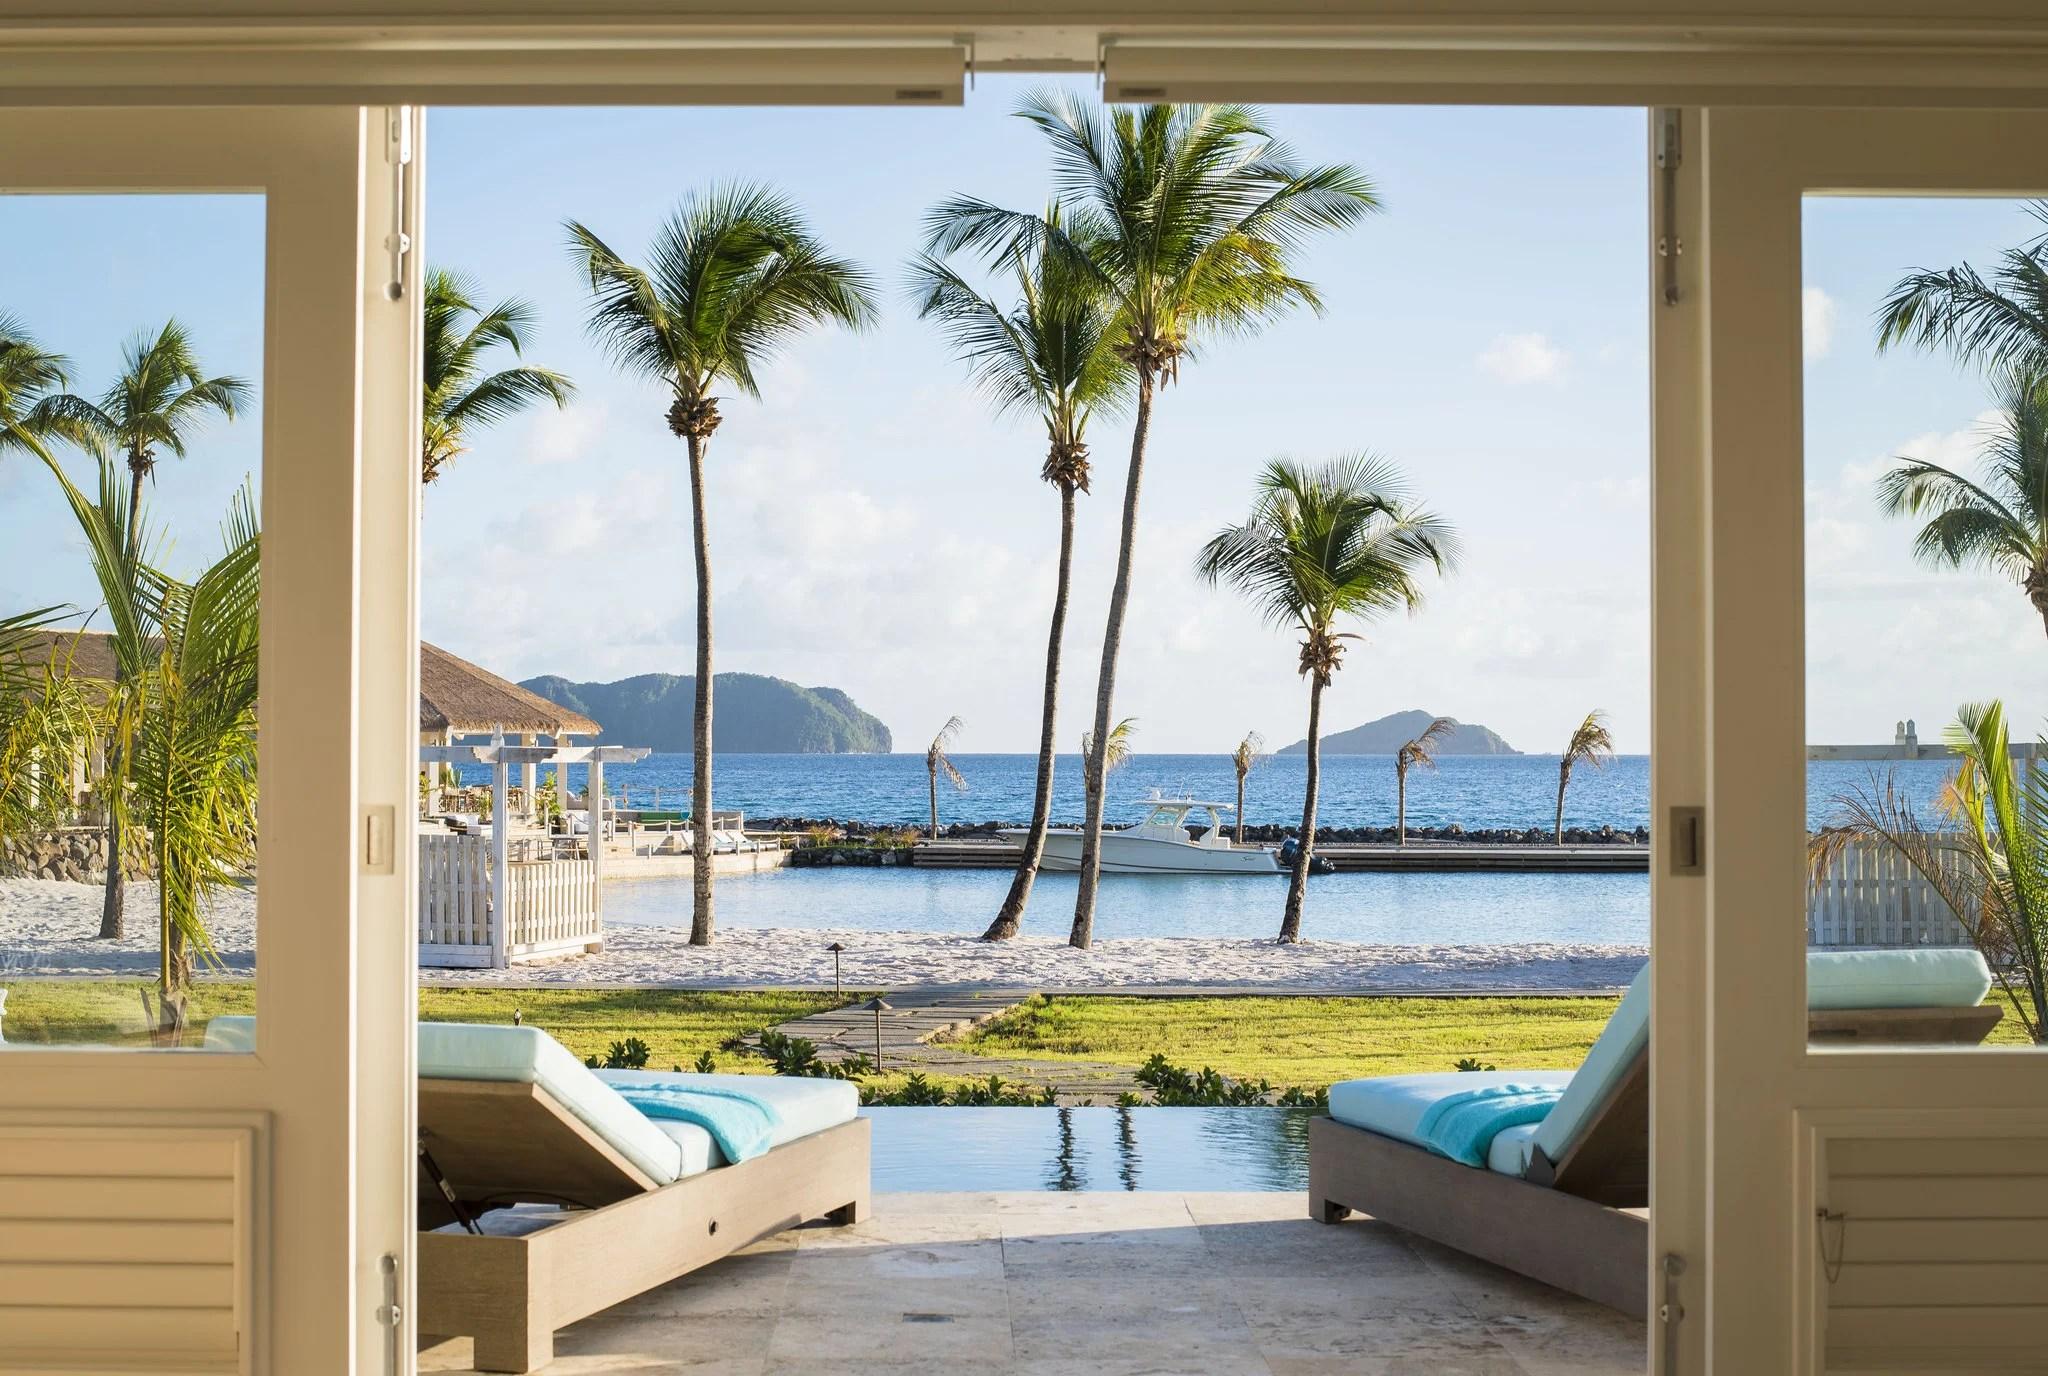 Best Ways to Use Hyatt Points at New Luxury Hotels